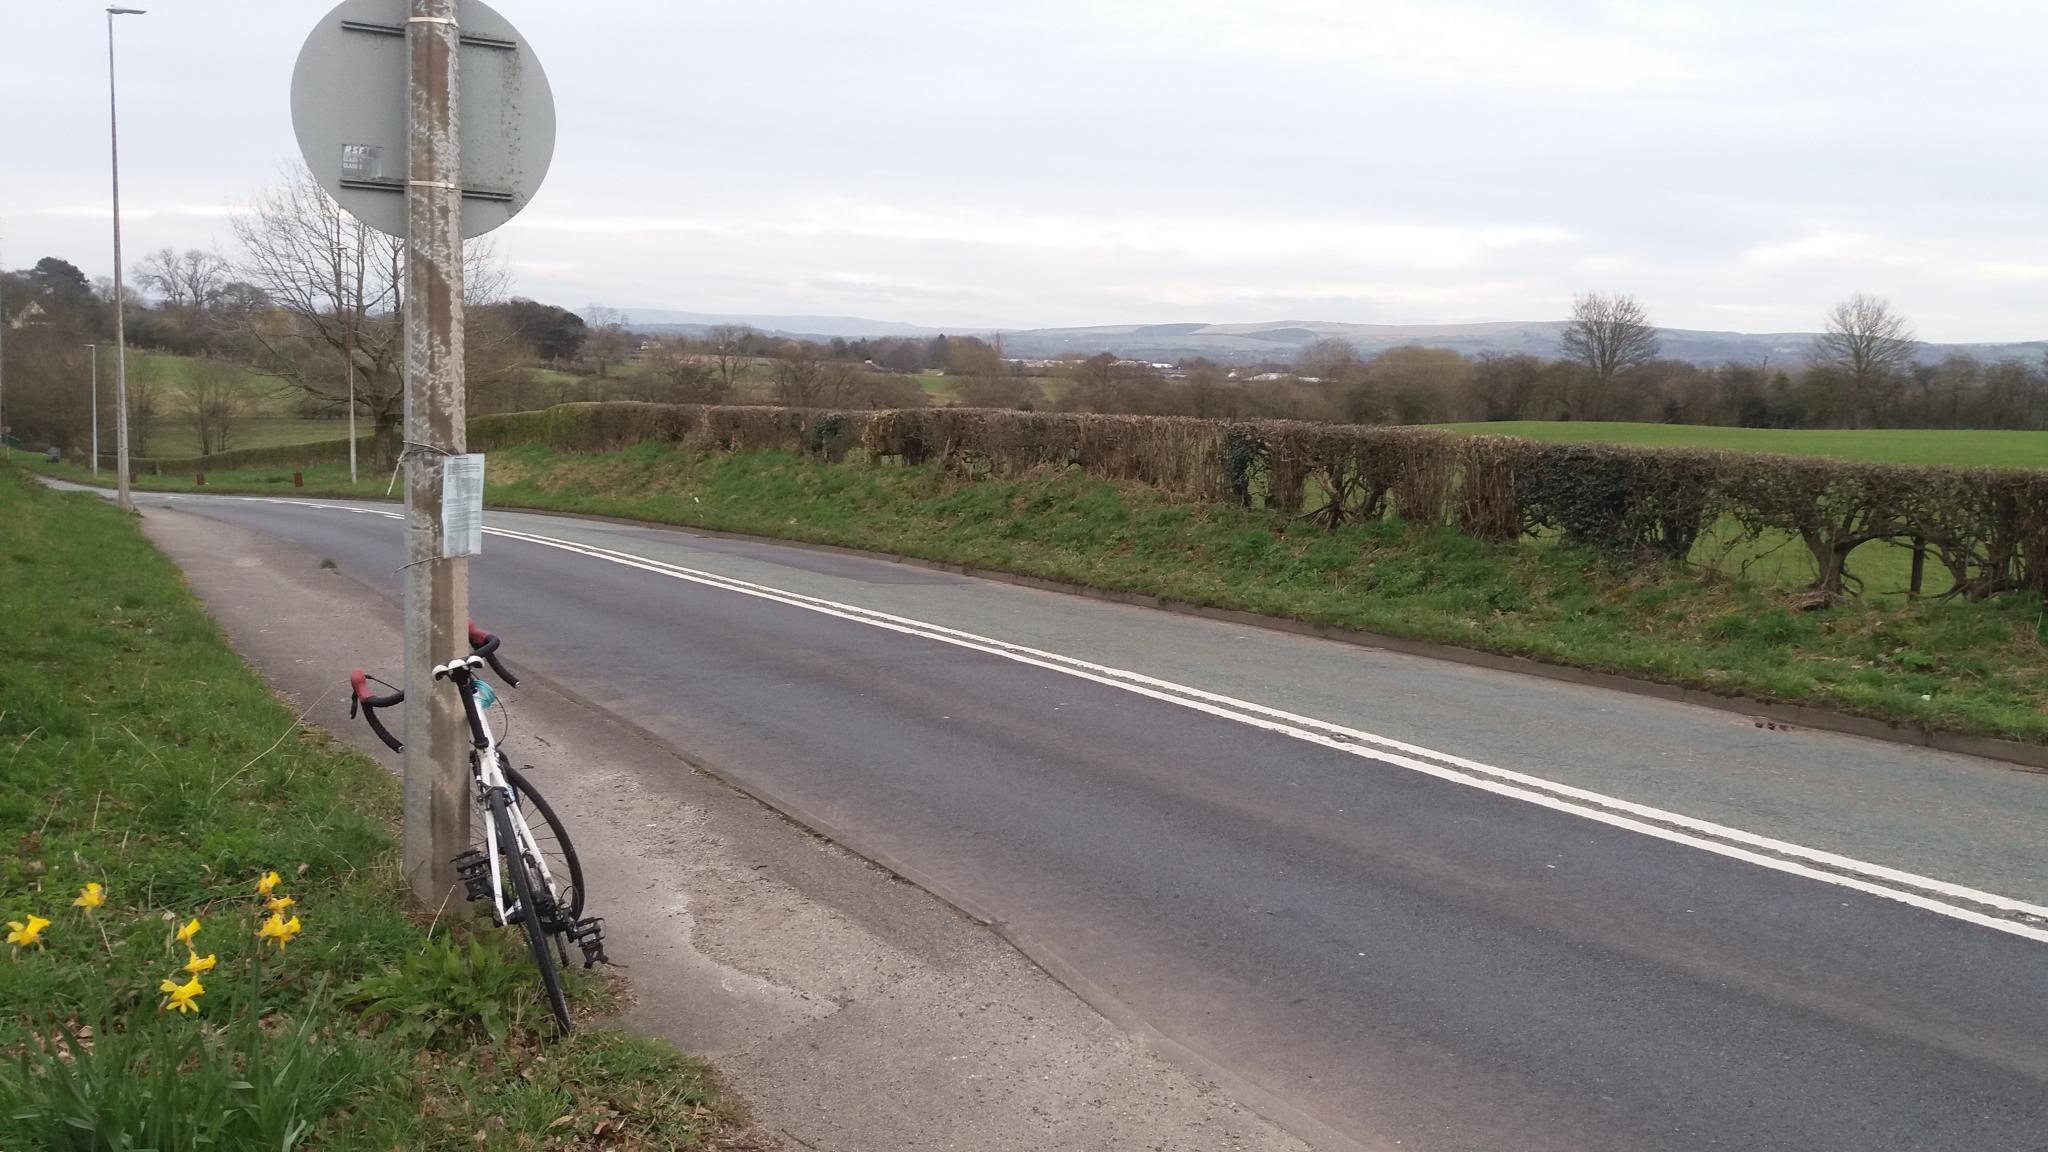 On my bike-20200321_173012-jpg